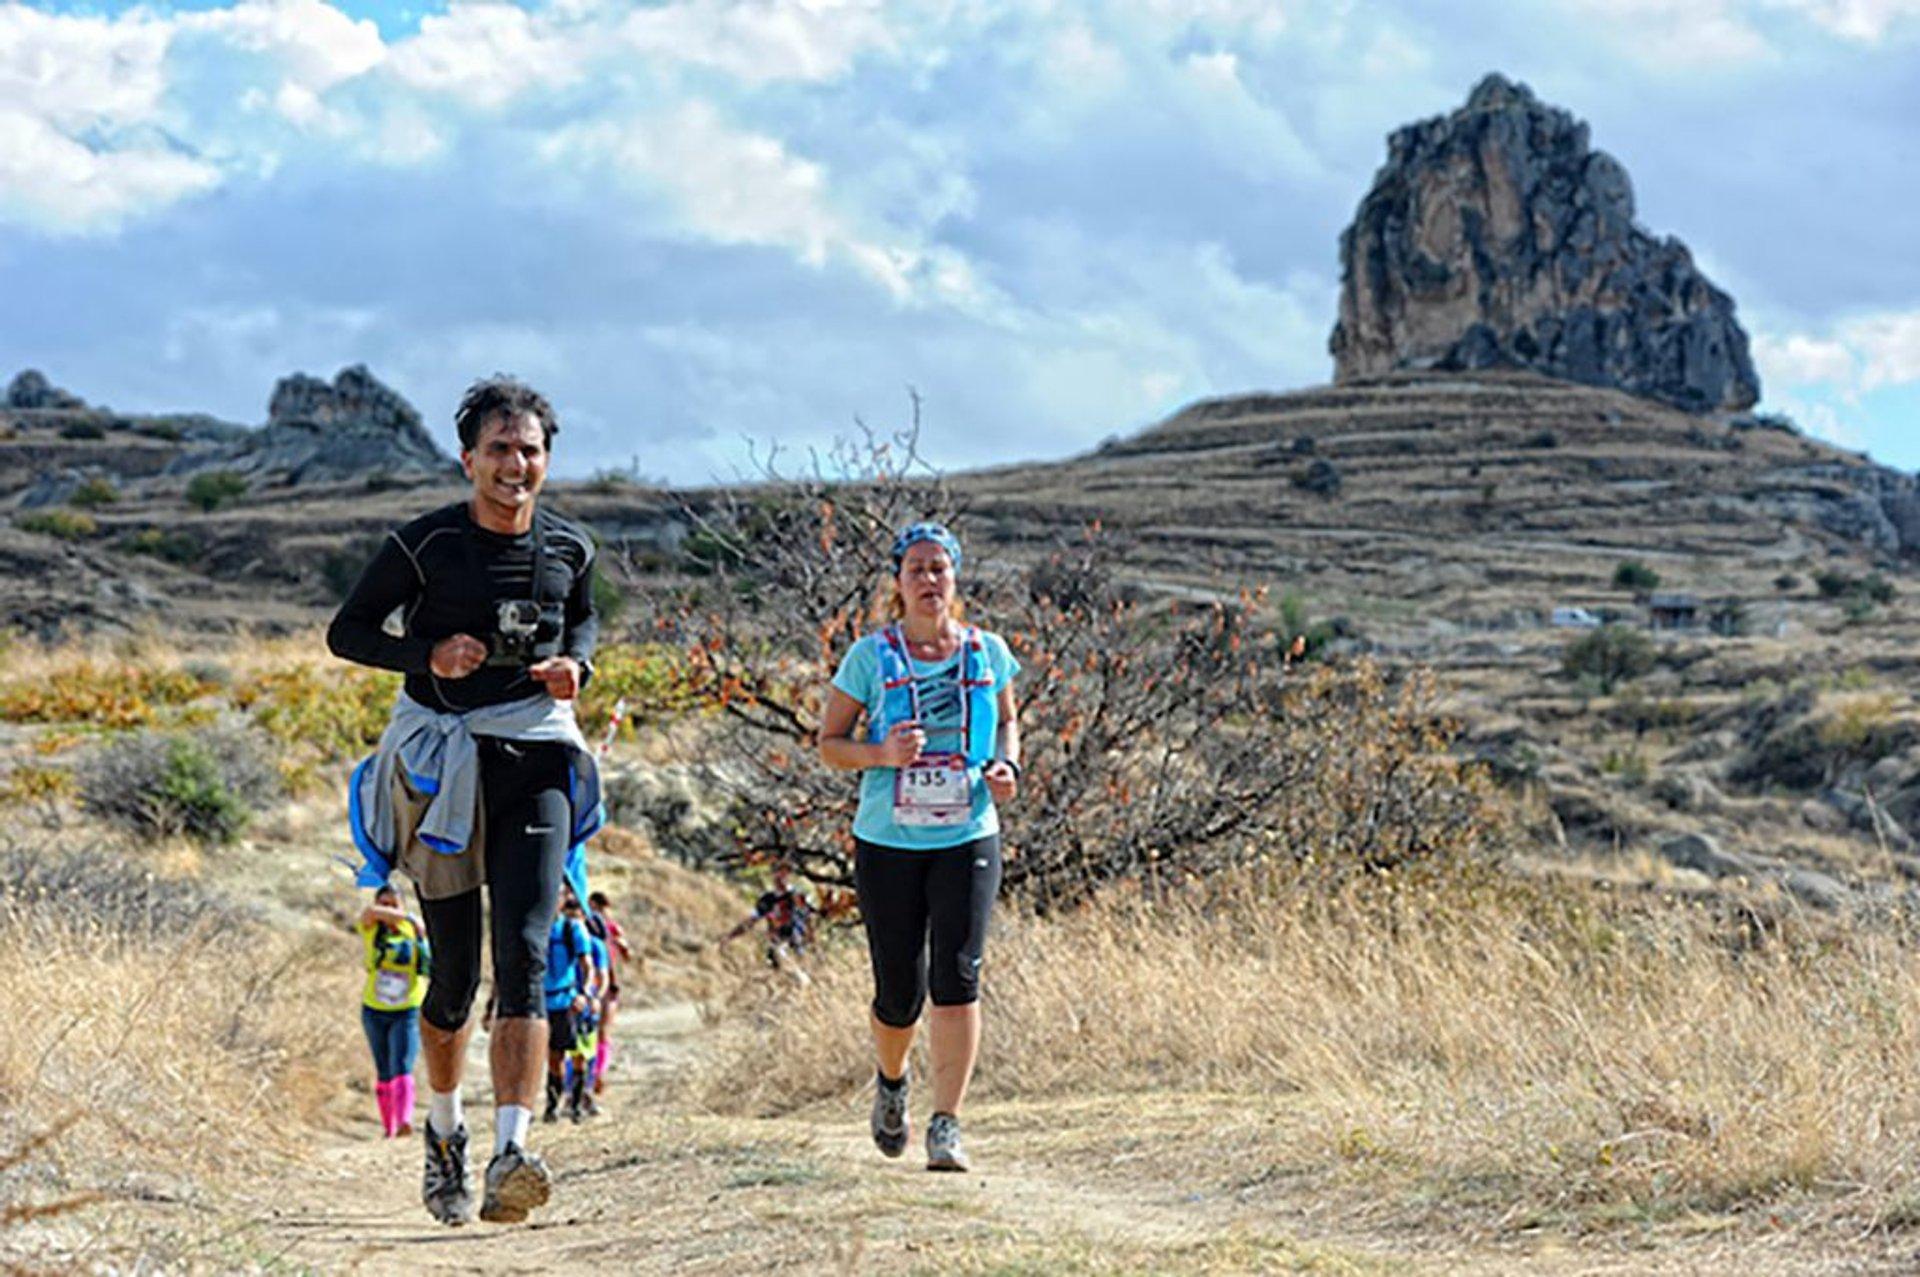 Cappadocia Ultra Trail in Cappadocia 2020 - Best Time